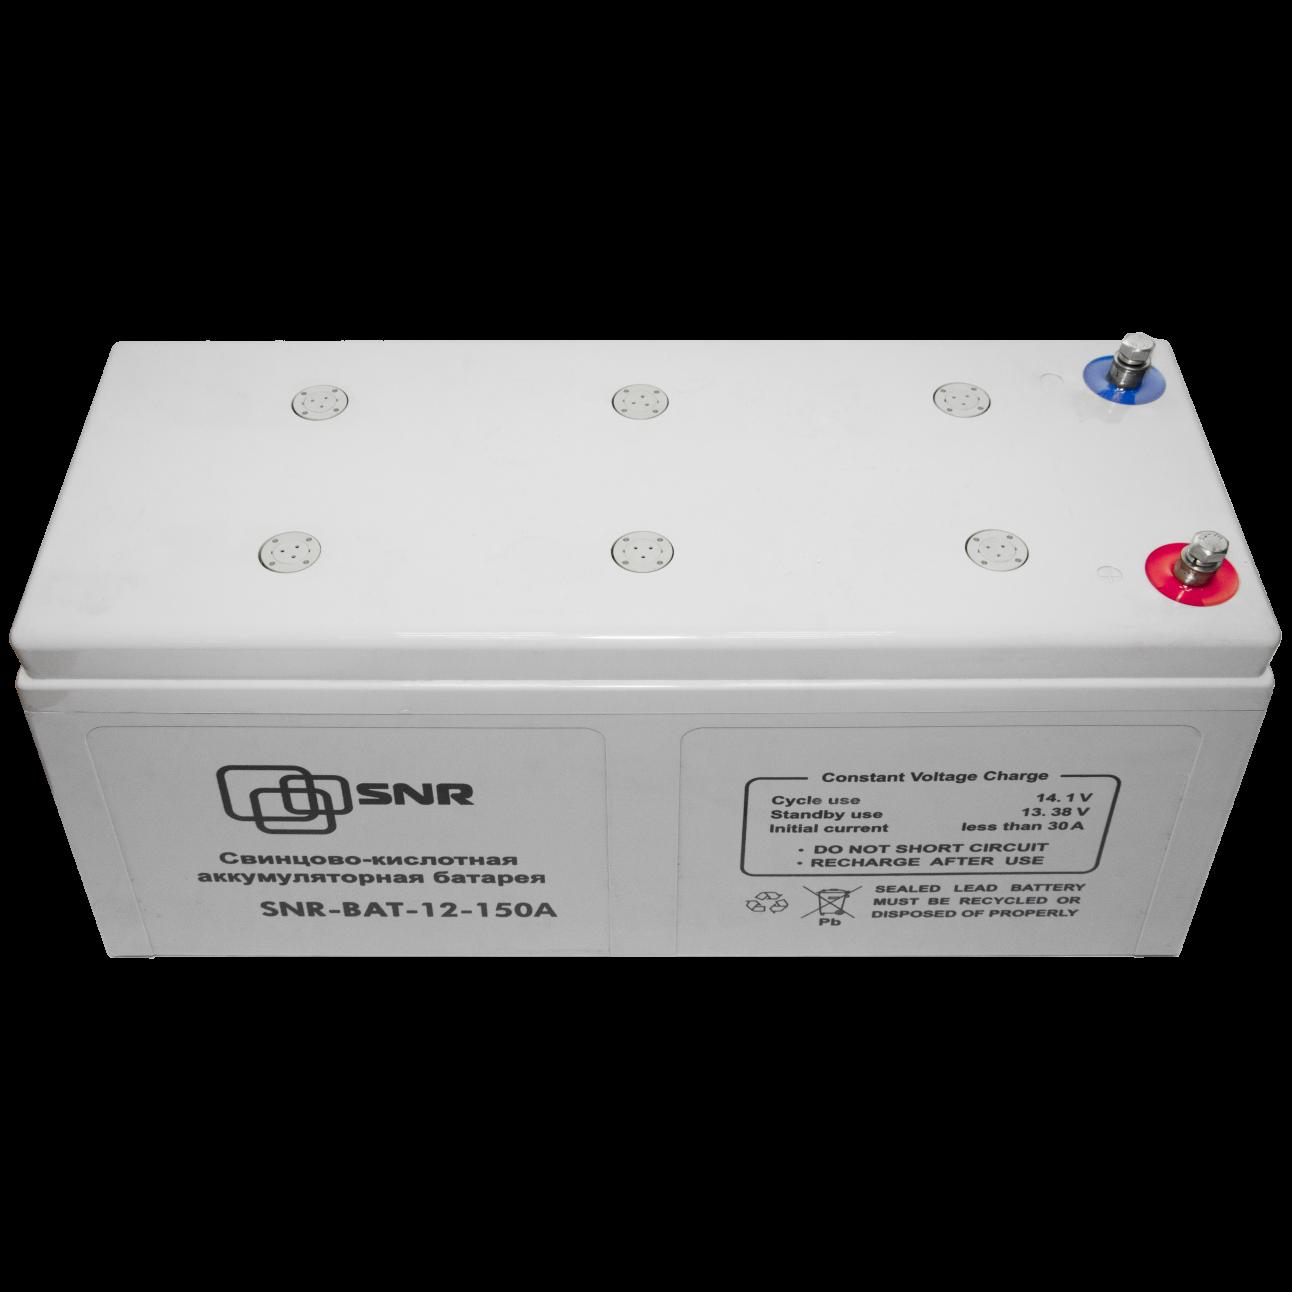 Аккумуляторная батарея SNR-BAT-12-150A для ИБП (с потертостями на корпусе, без упаковки)